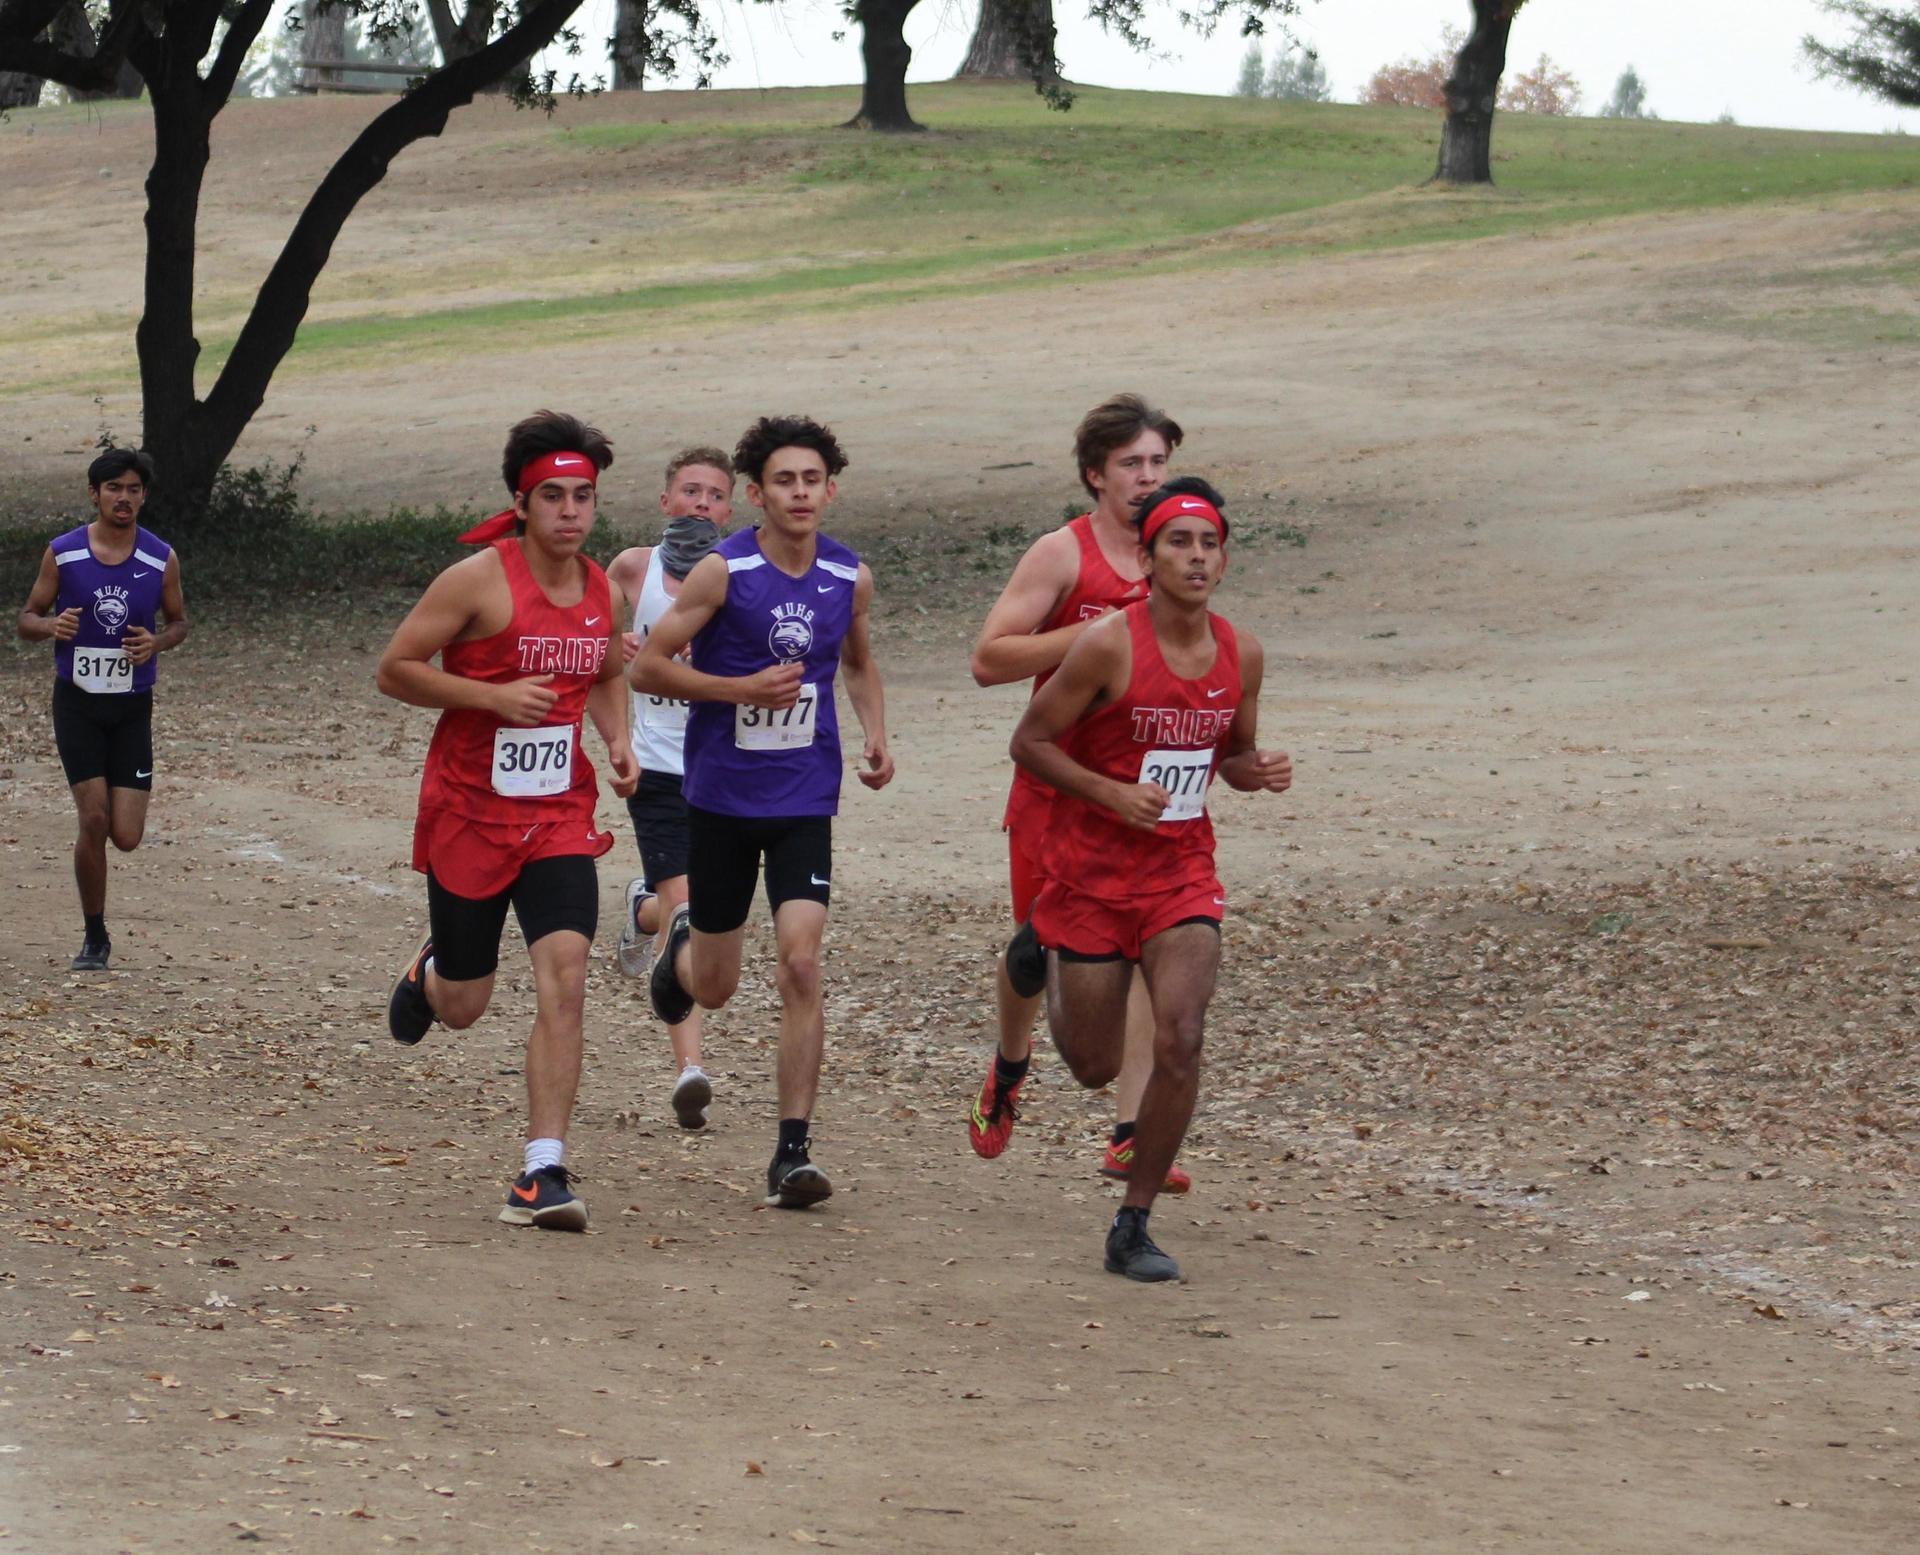 Nicholas Martinez, Raymond Mendoza and Nick Upton racing at woodward park